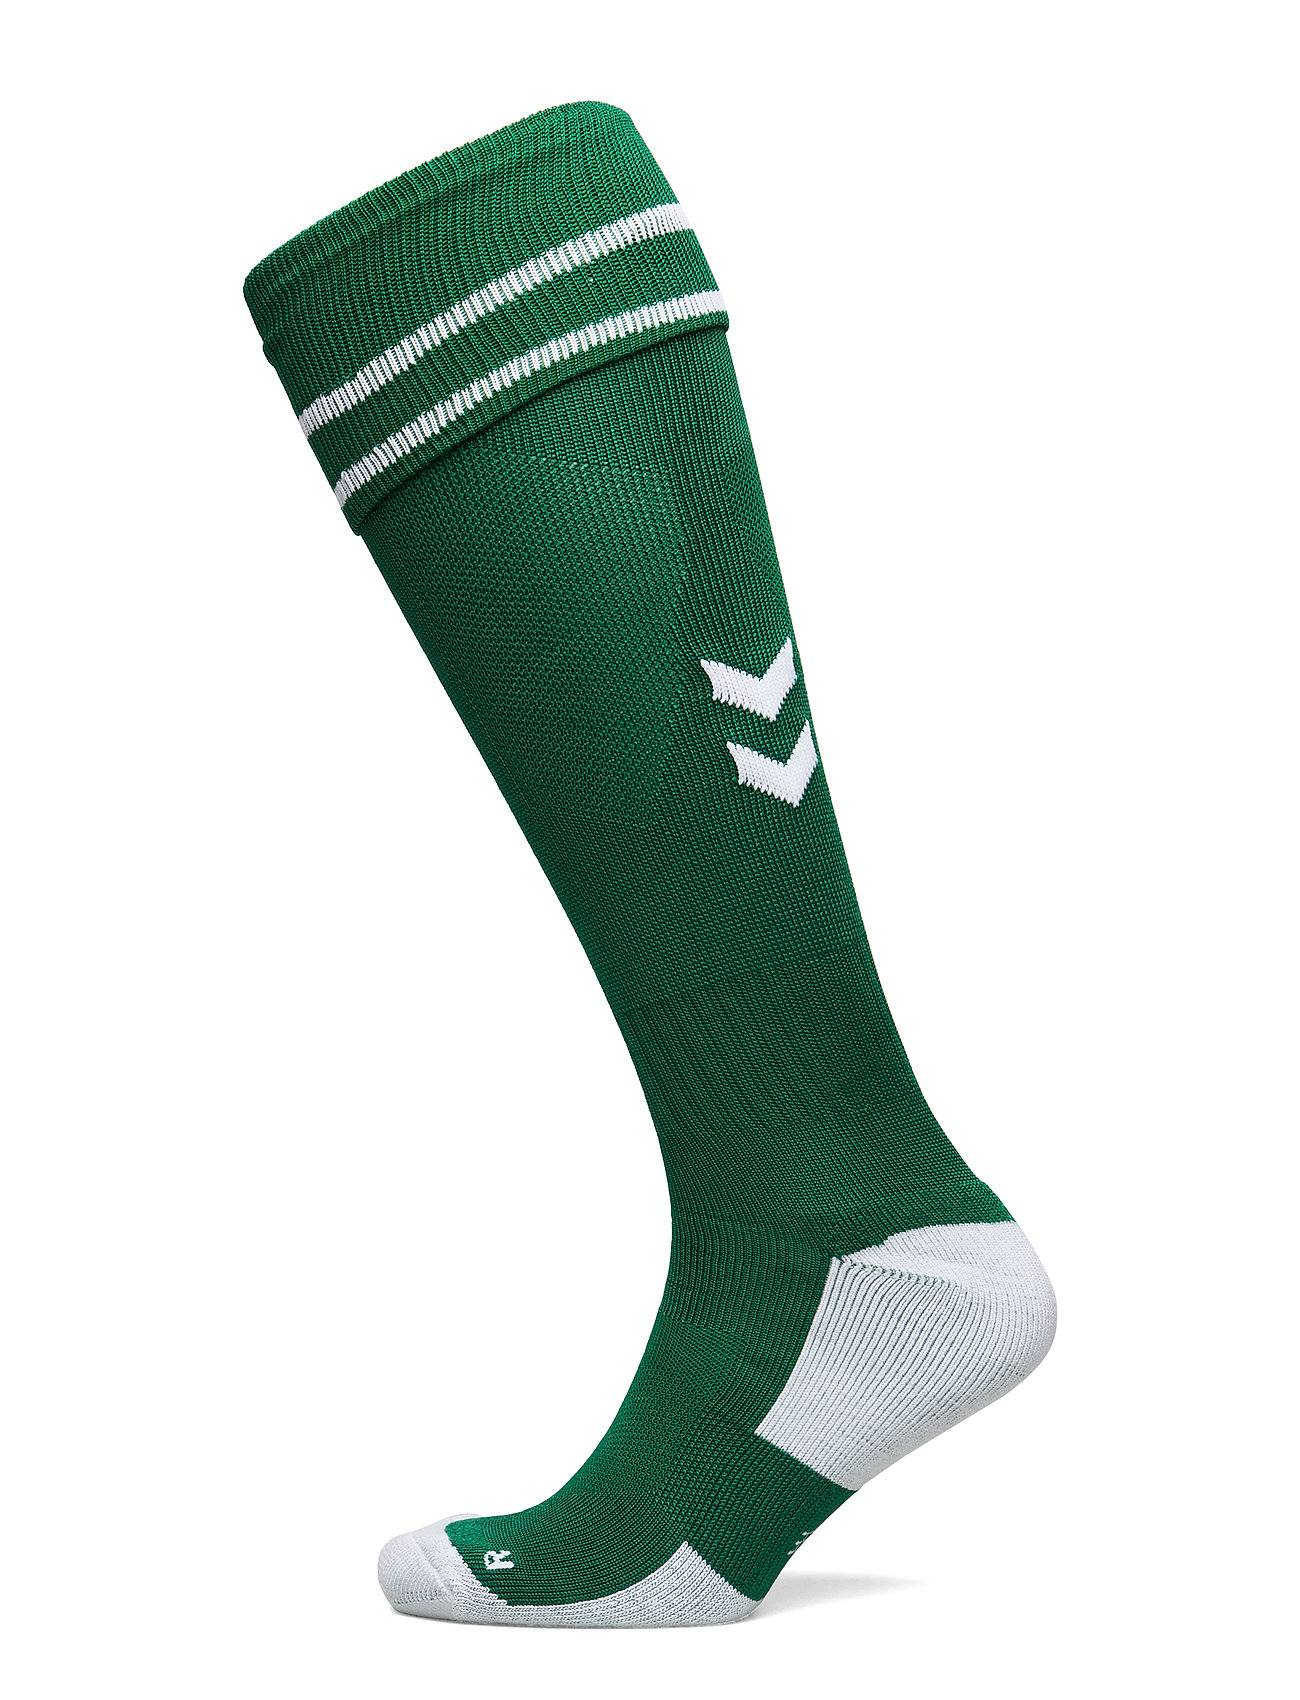 Hummel Element Football Sock Underwear Socks Football Socks Grønn Hummel